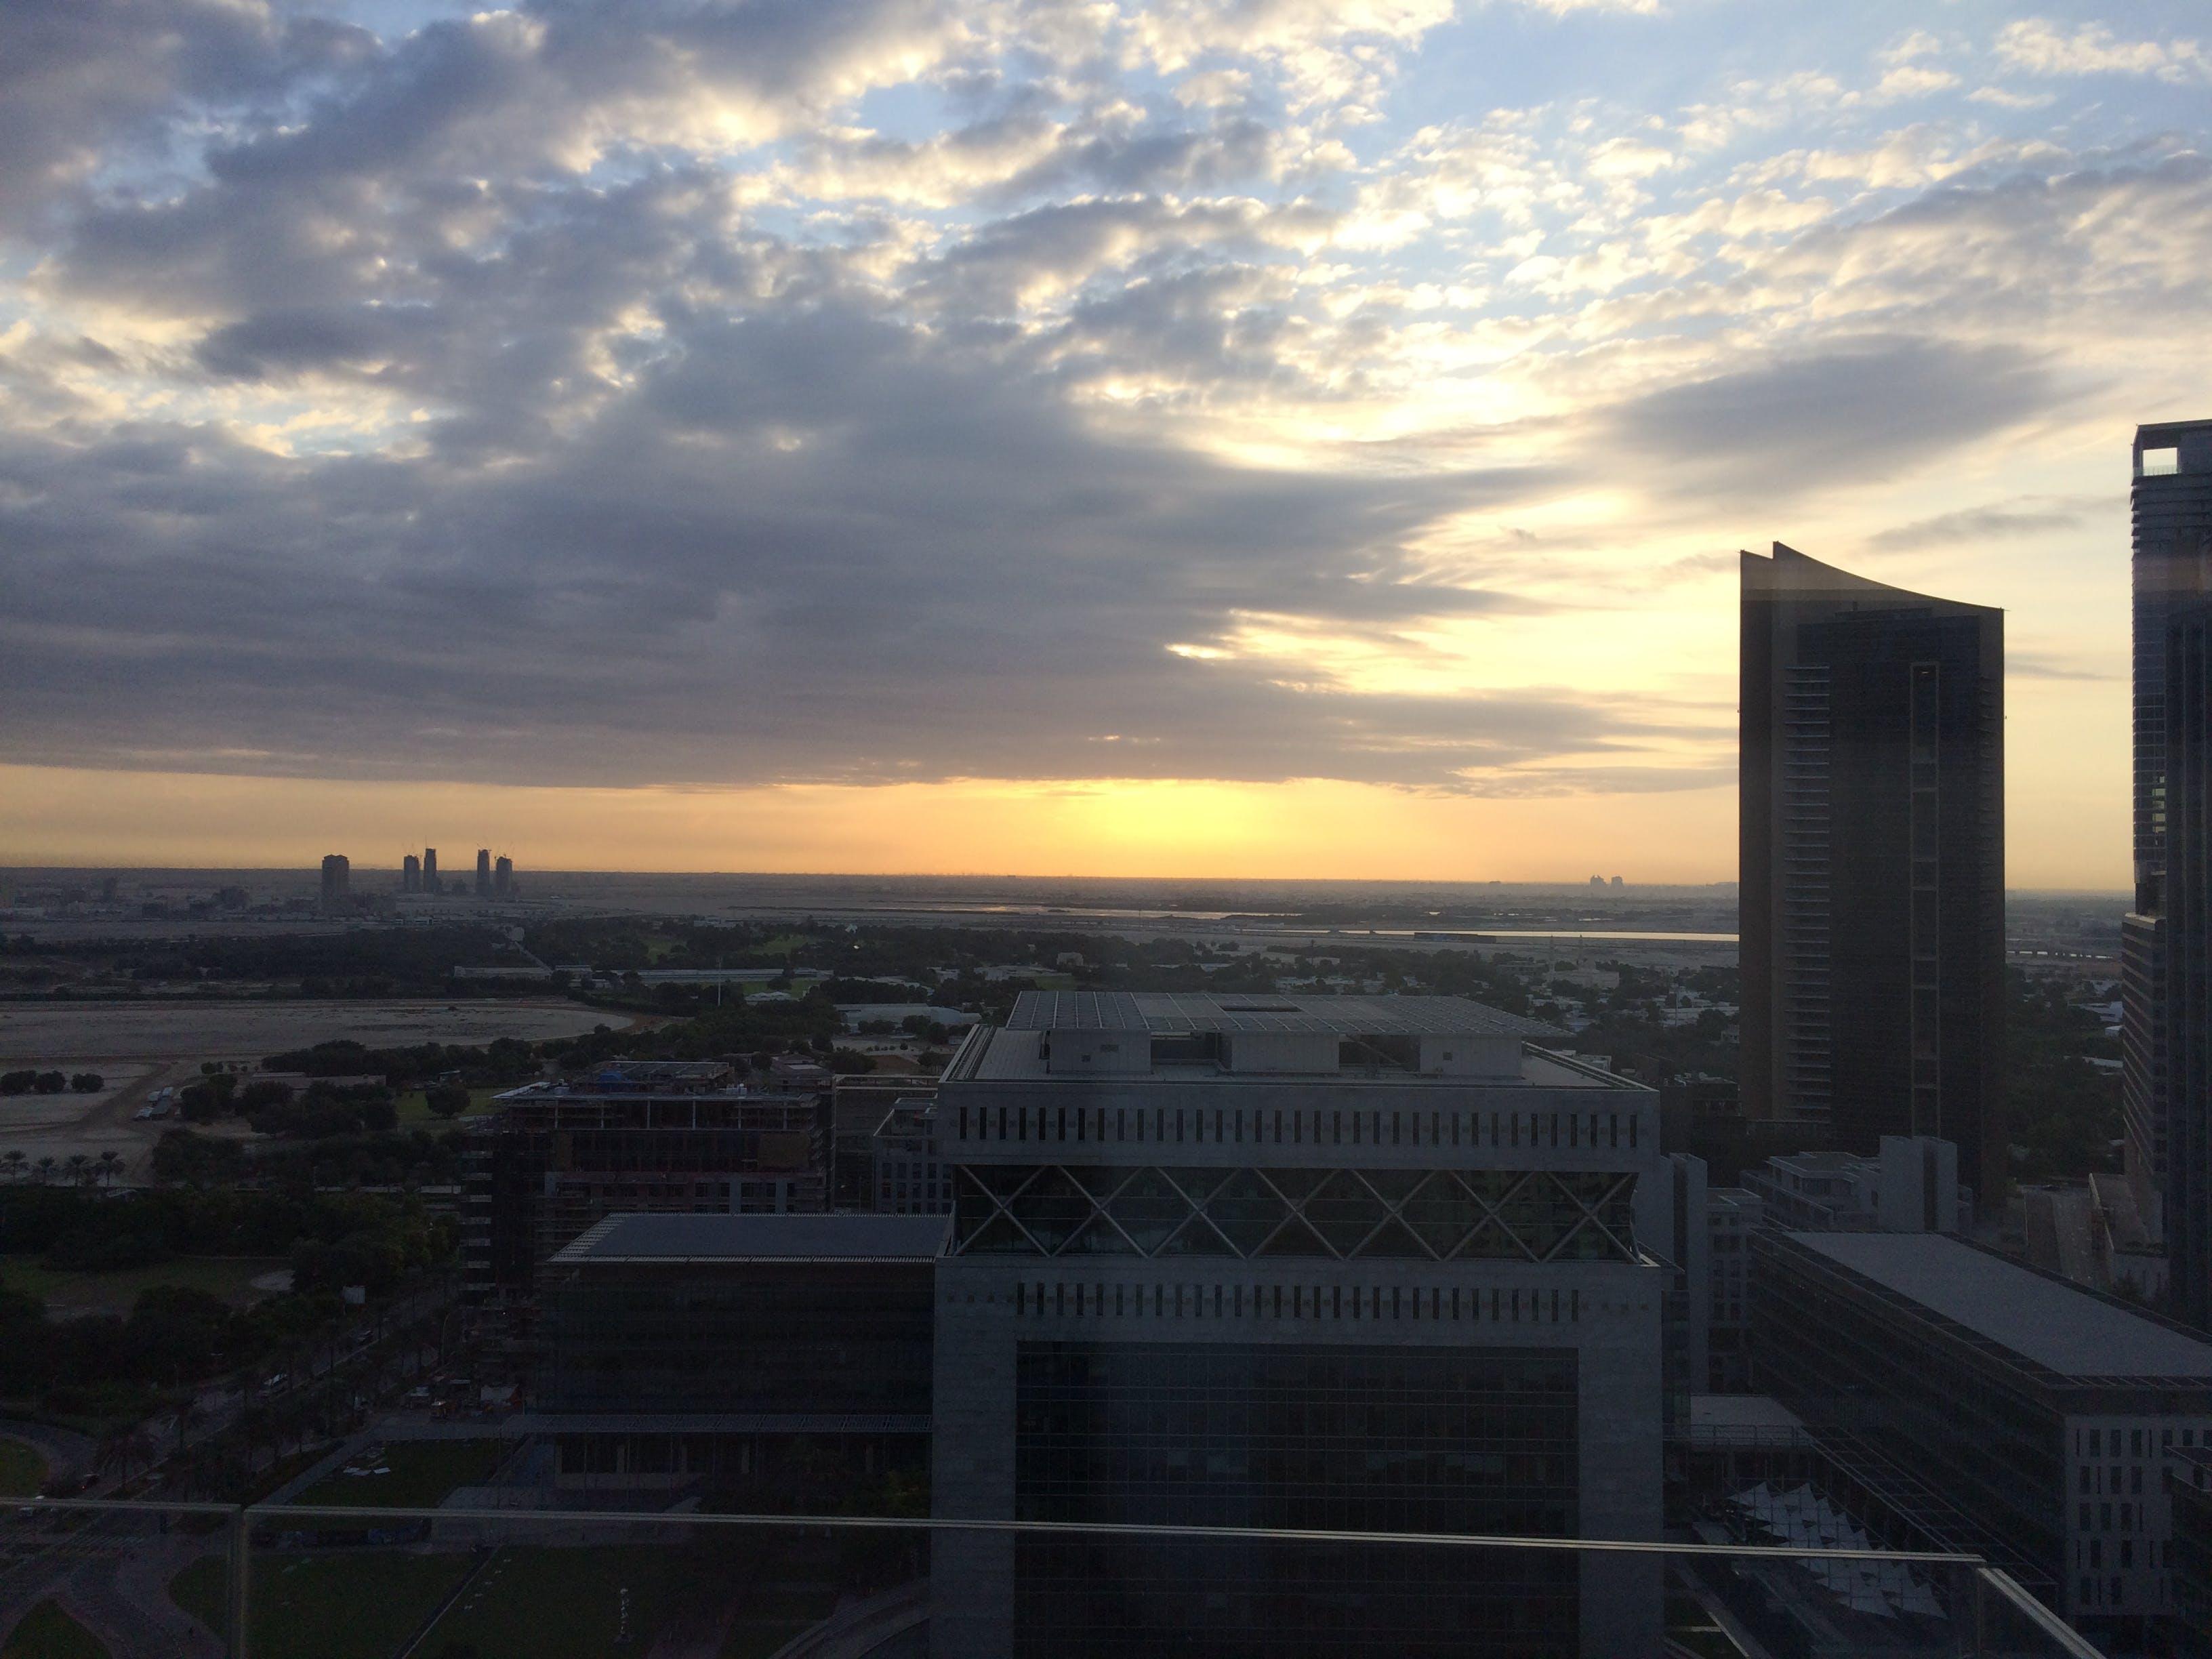 Free stock photo of Dubai morning clouds, hello sunshine